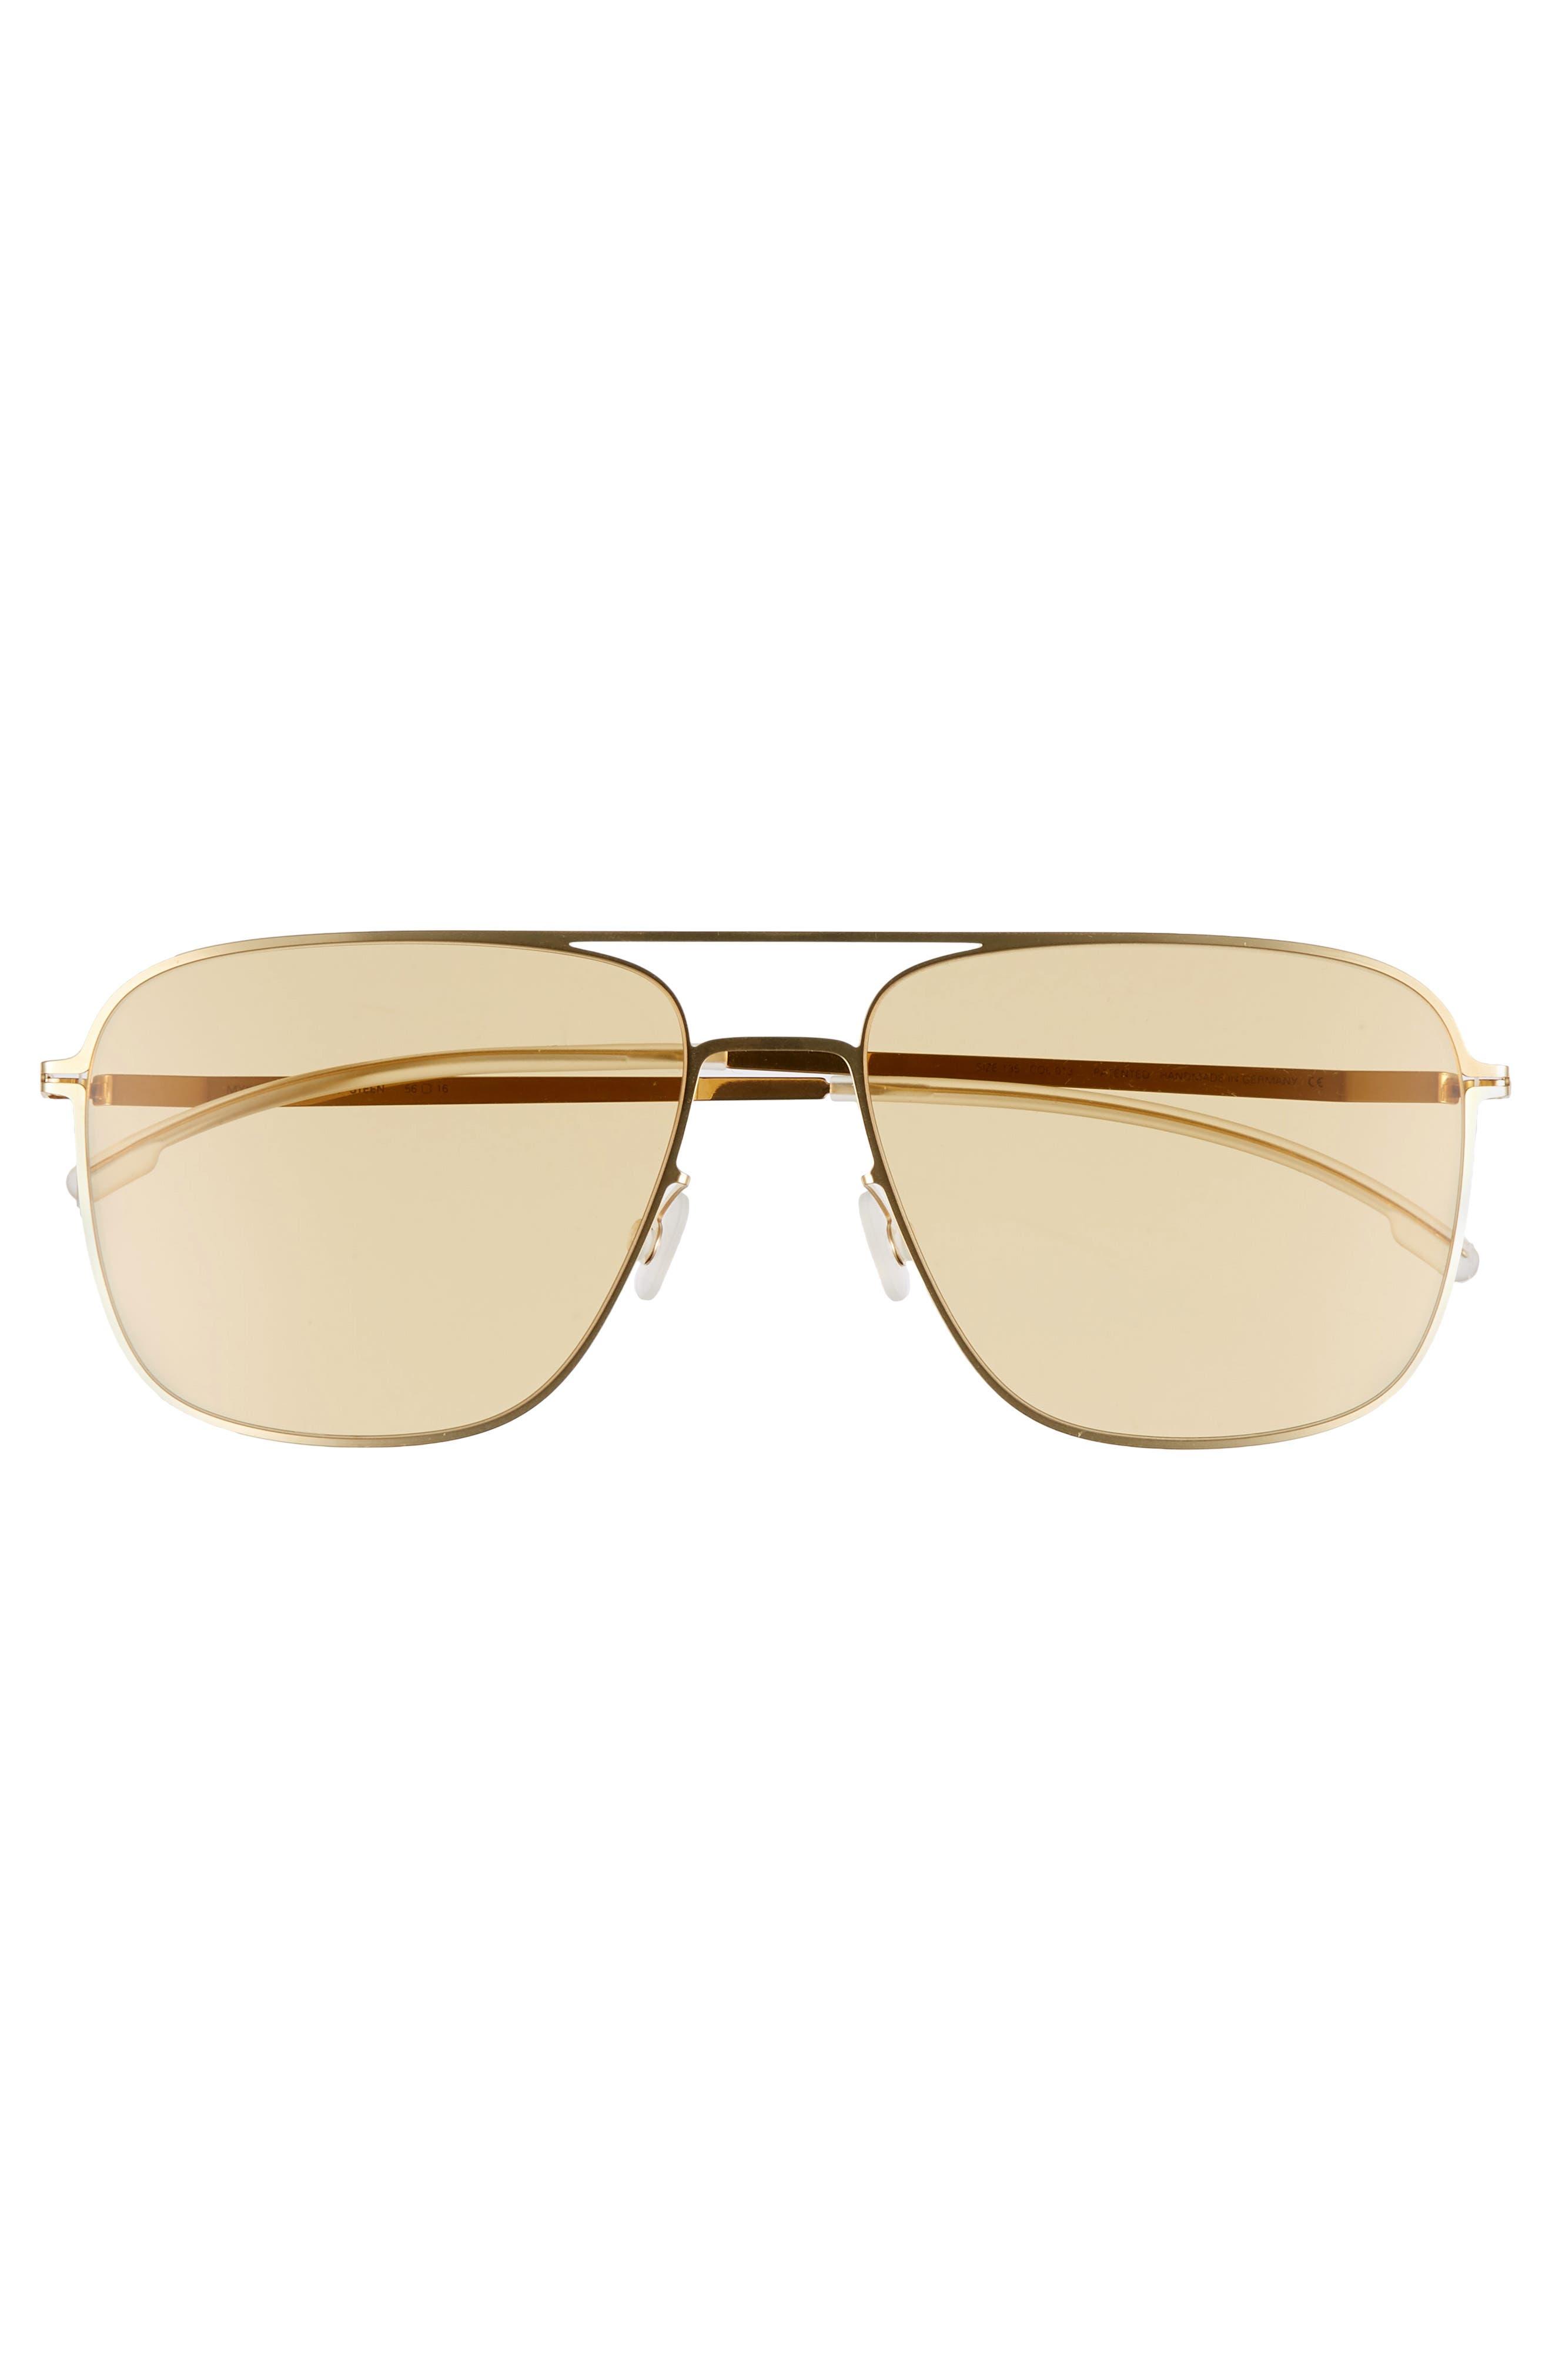 Steen 56mm Aviator Sunglasses,                             Alternate thumbnail 2, color,                             Glossy Gold